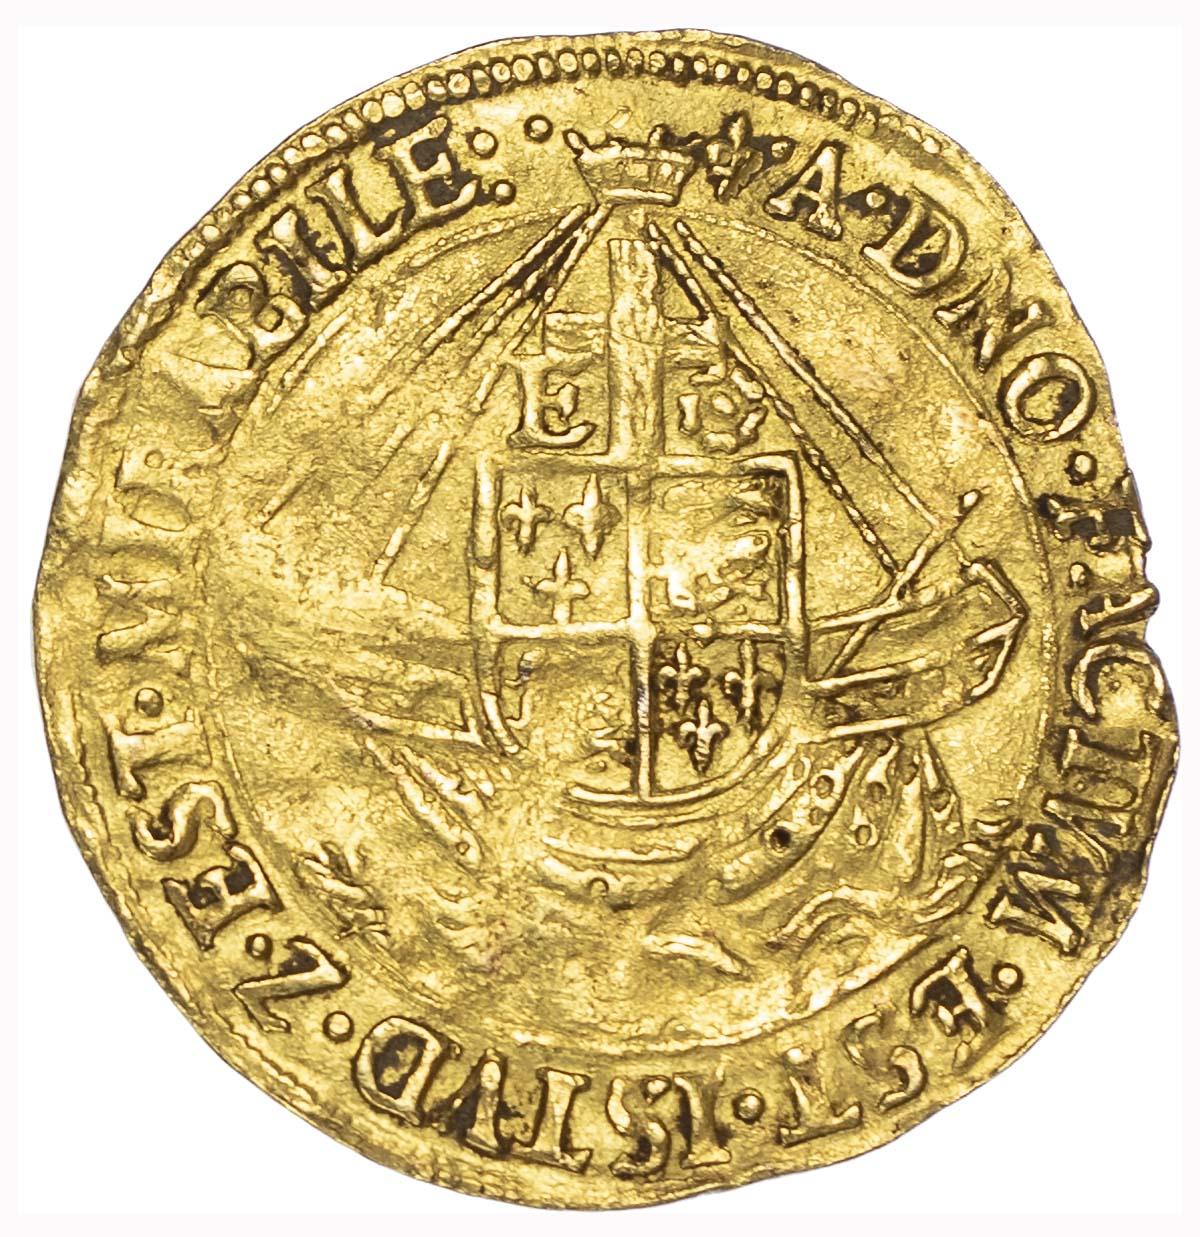 Elizabeth I (1558-1603), first issue, Angel, mintmark lis (1559-60)